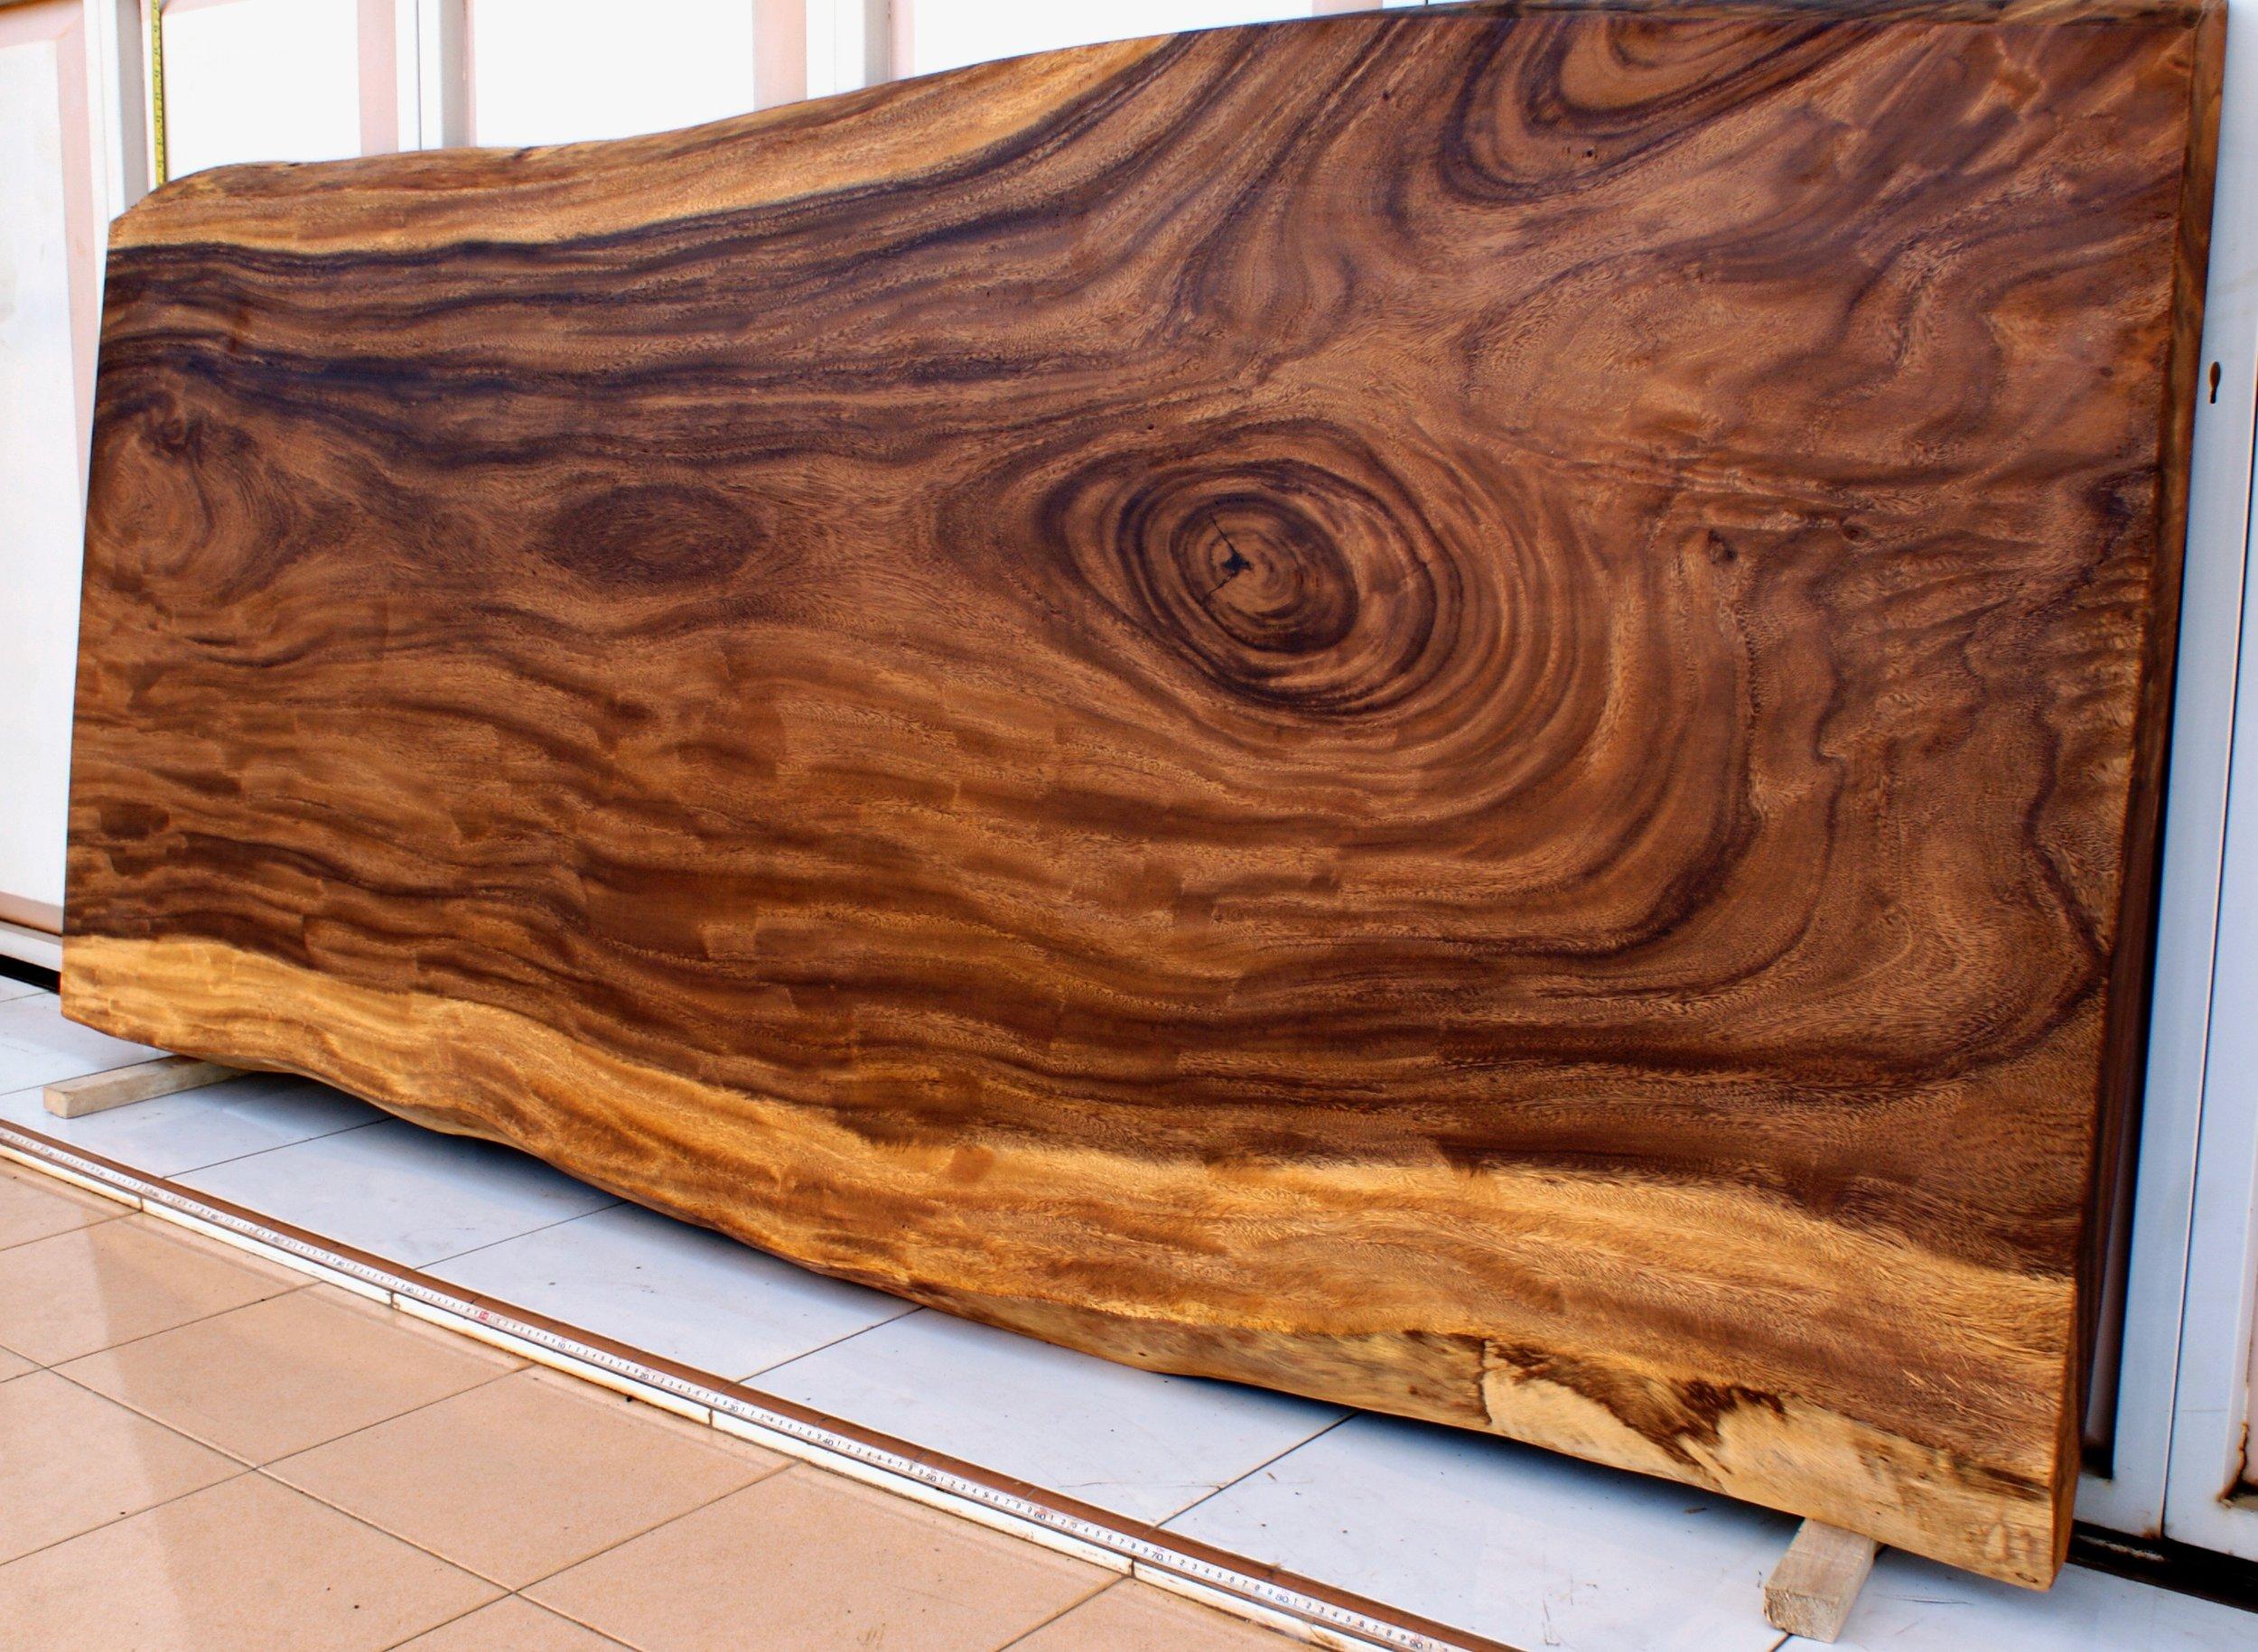 SUAR  Материал: слэб дерева  суар  Размеры: 220 x 105 х 8 см